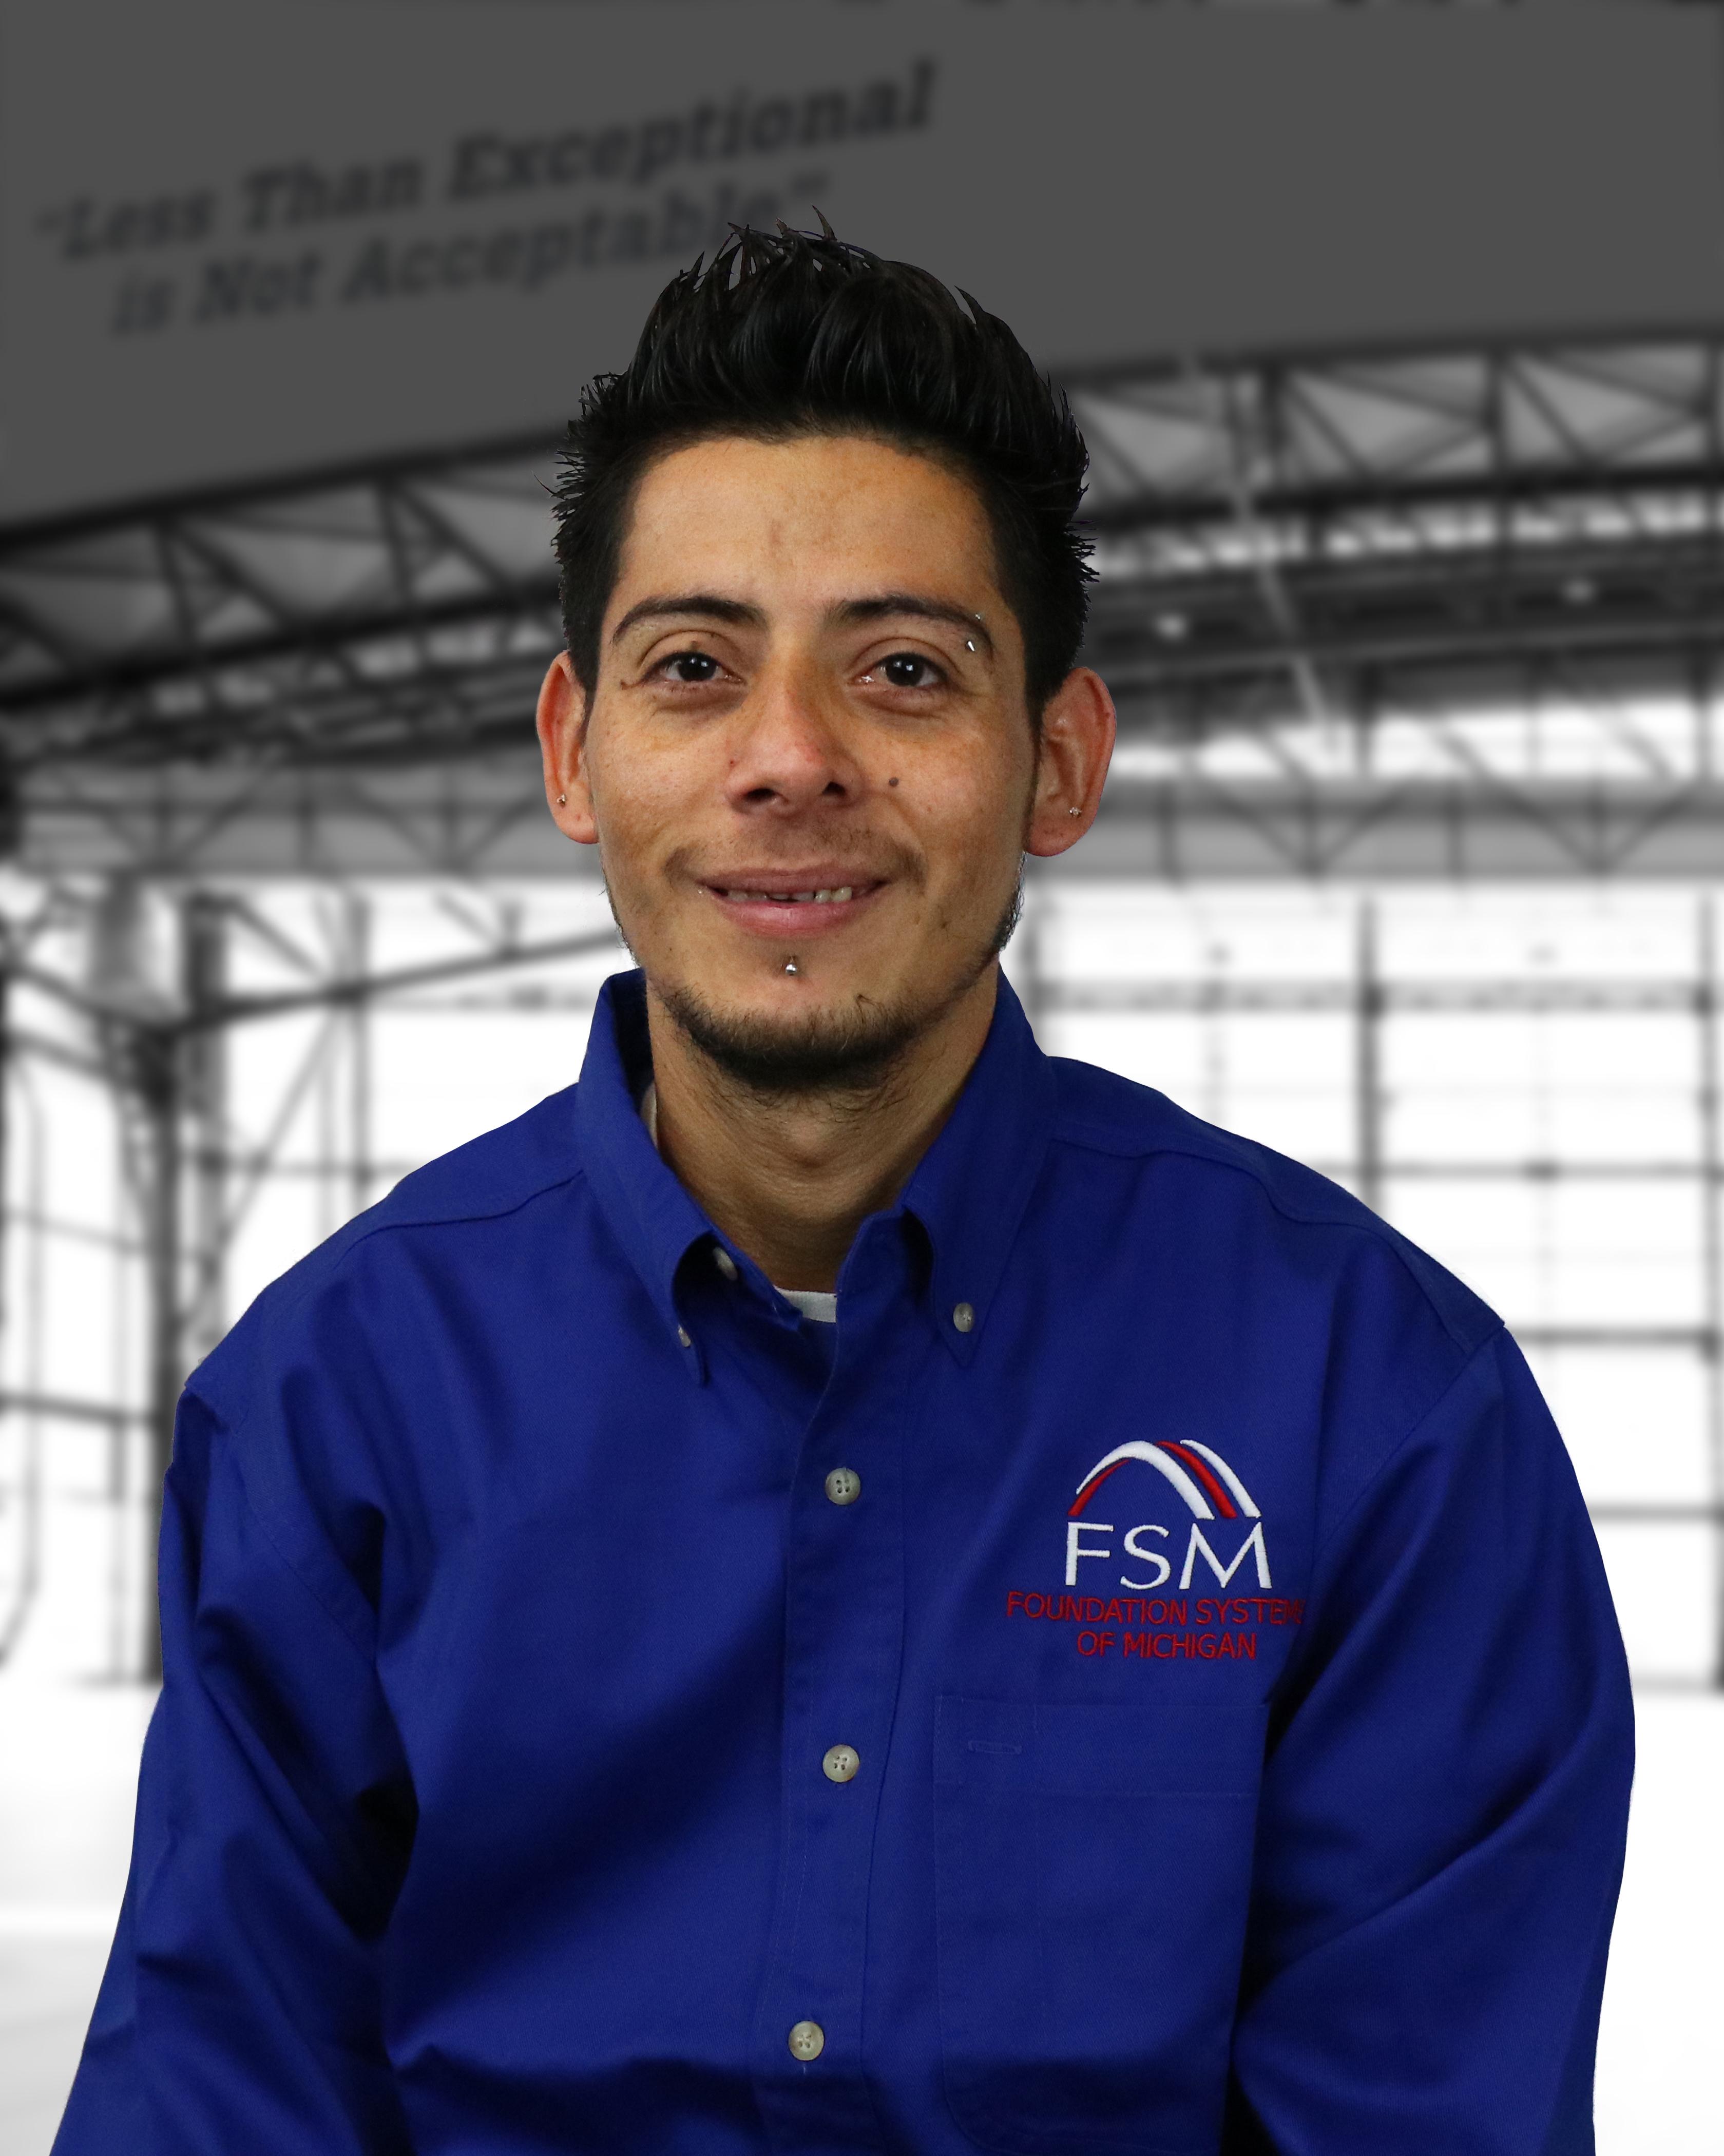 FSM Josue Ramos Foreman